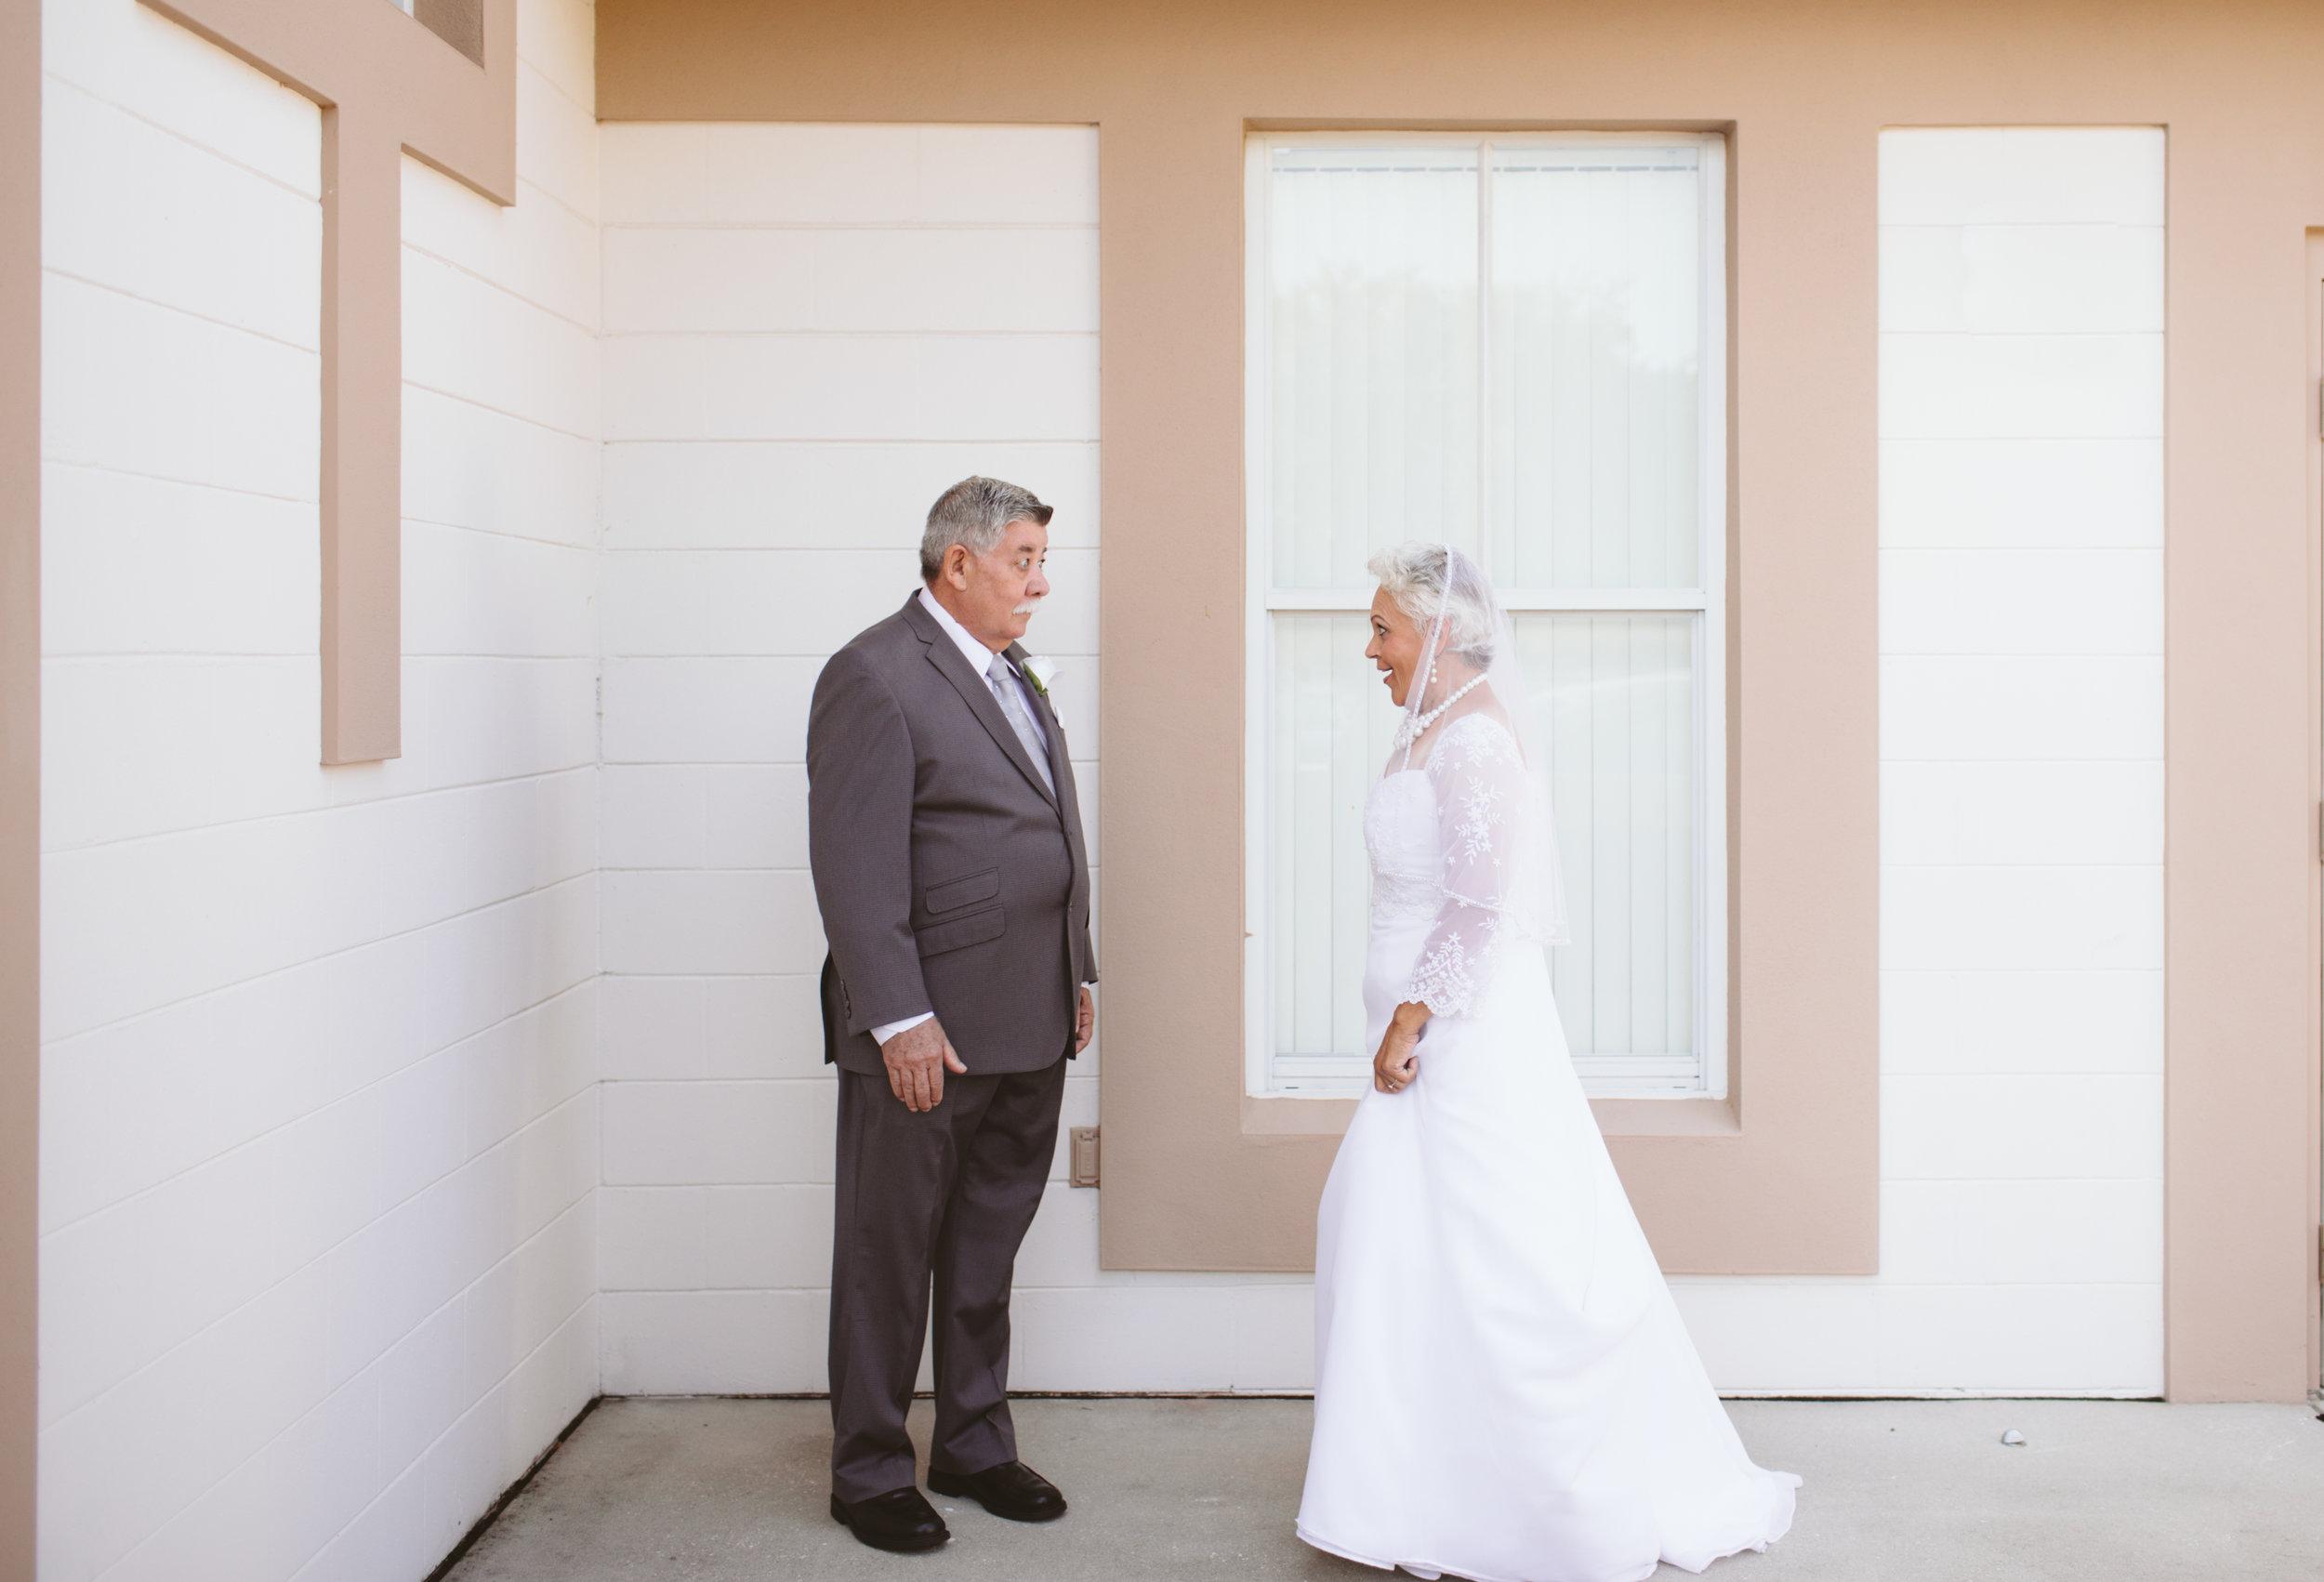 wedding | Vanessa Boy Photography | vanessaboy.com |-50.jpg